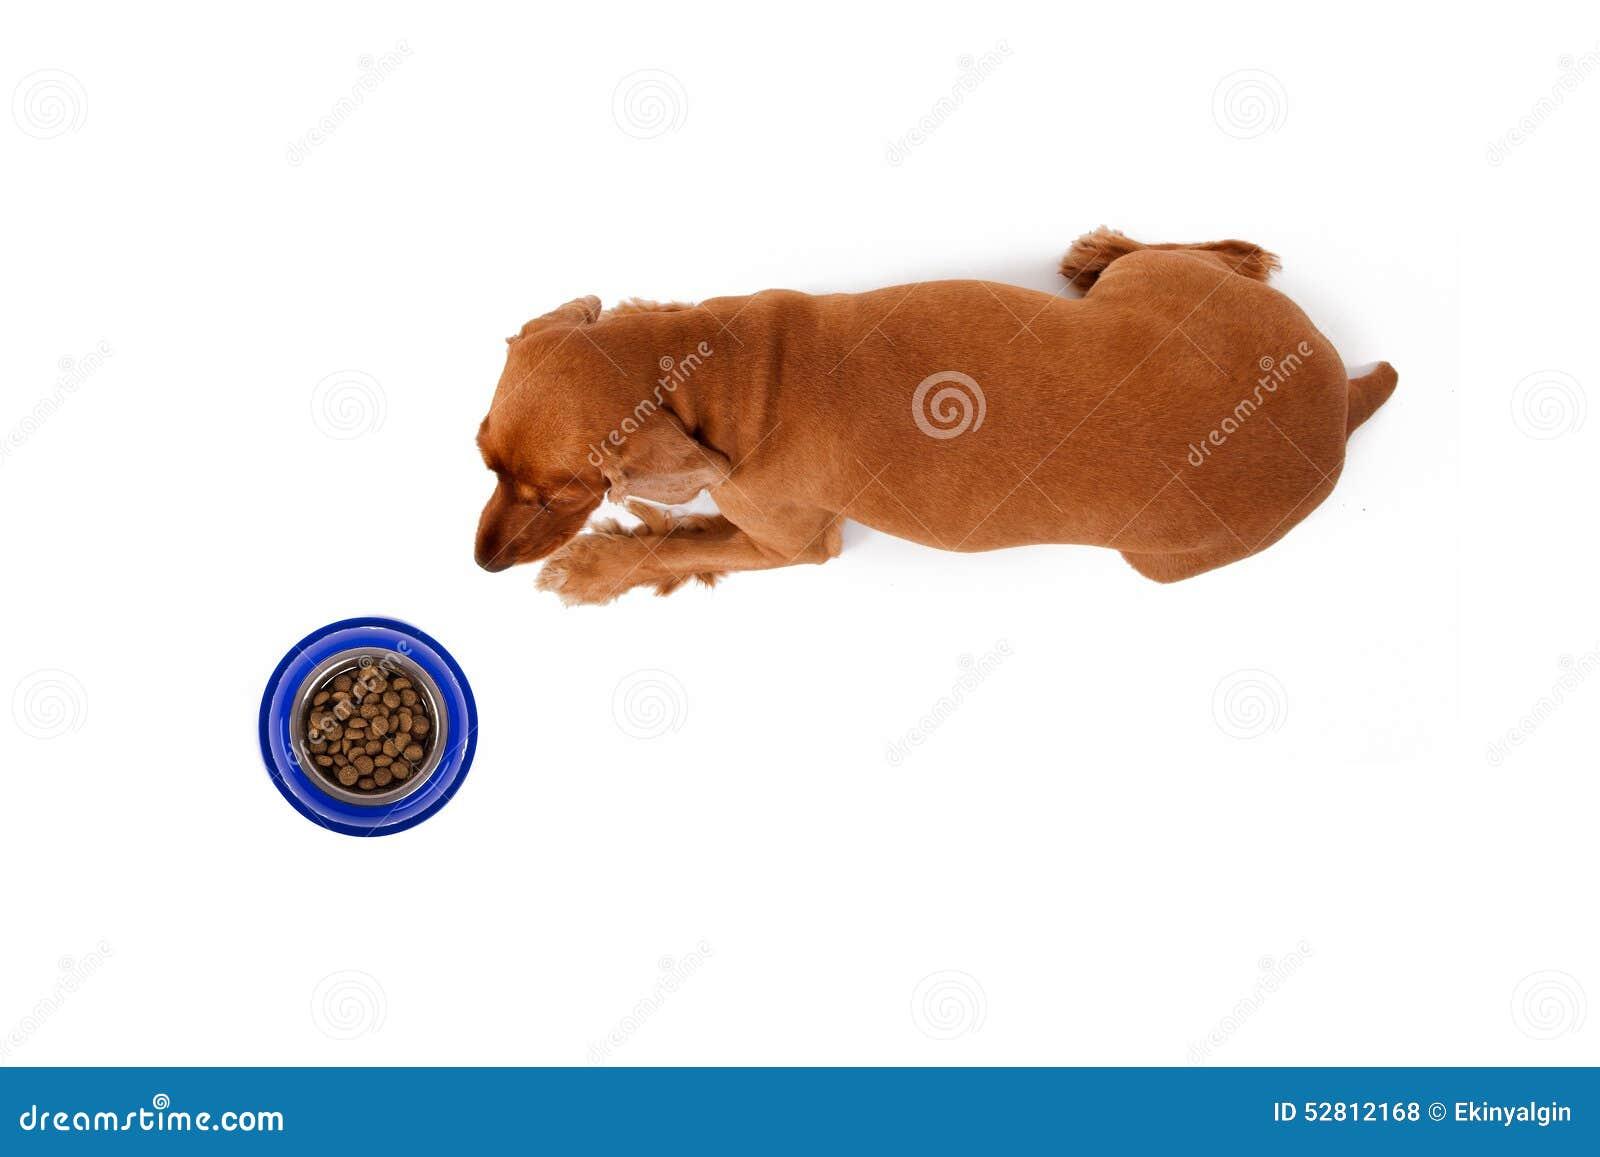 Dog Food Web Site